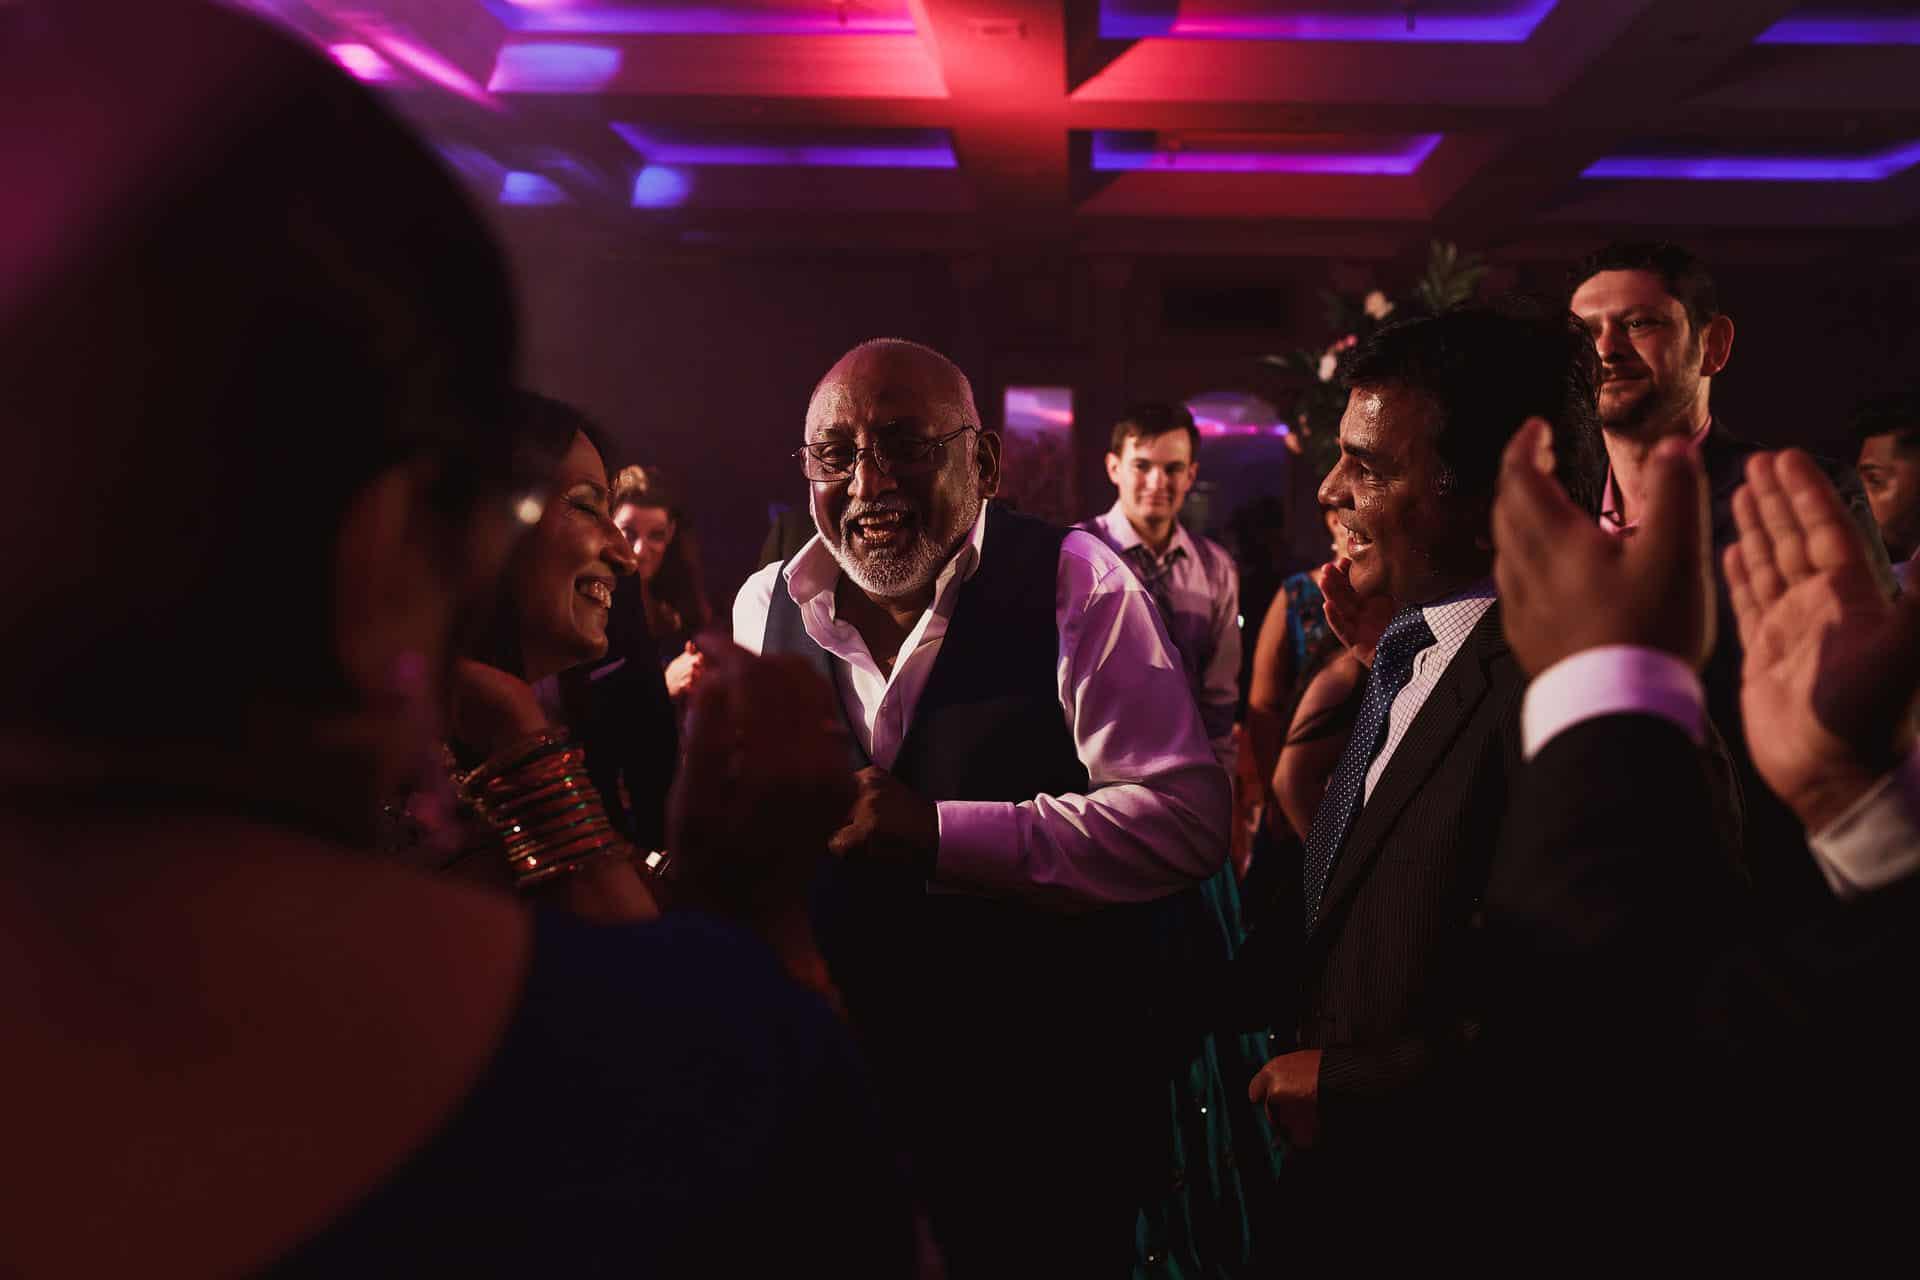 grand brighton sussex wedding reception